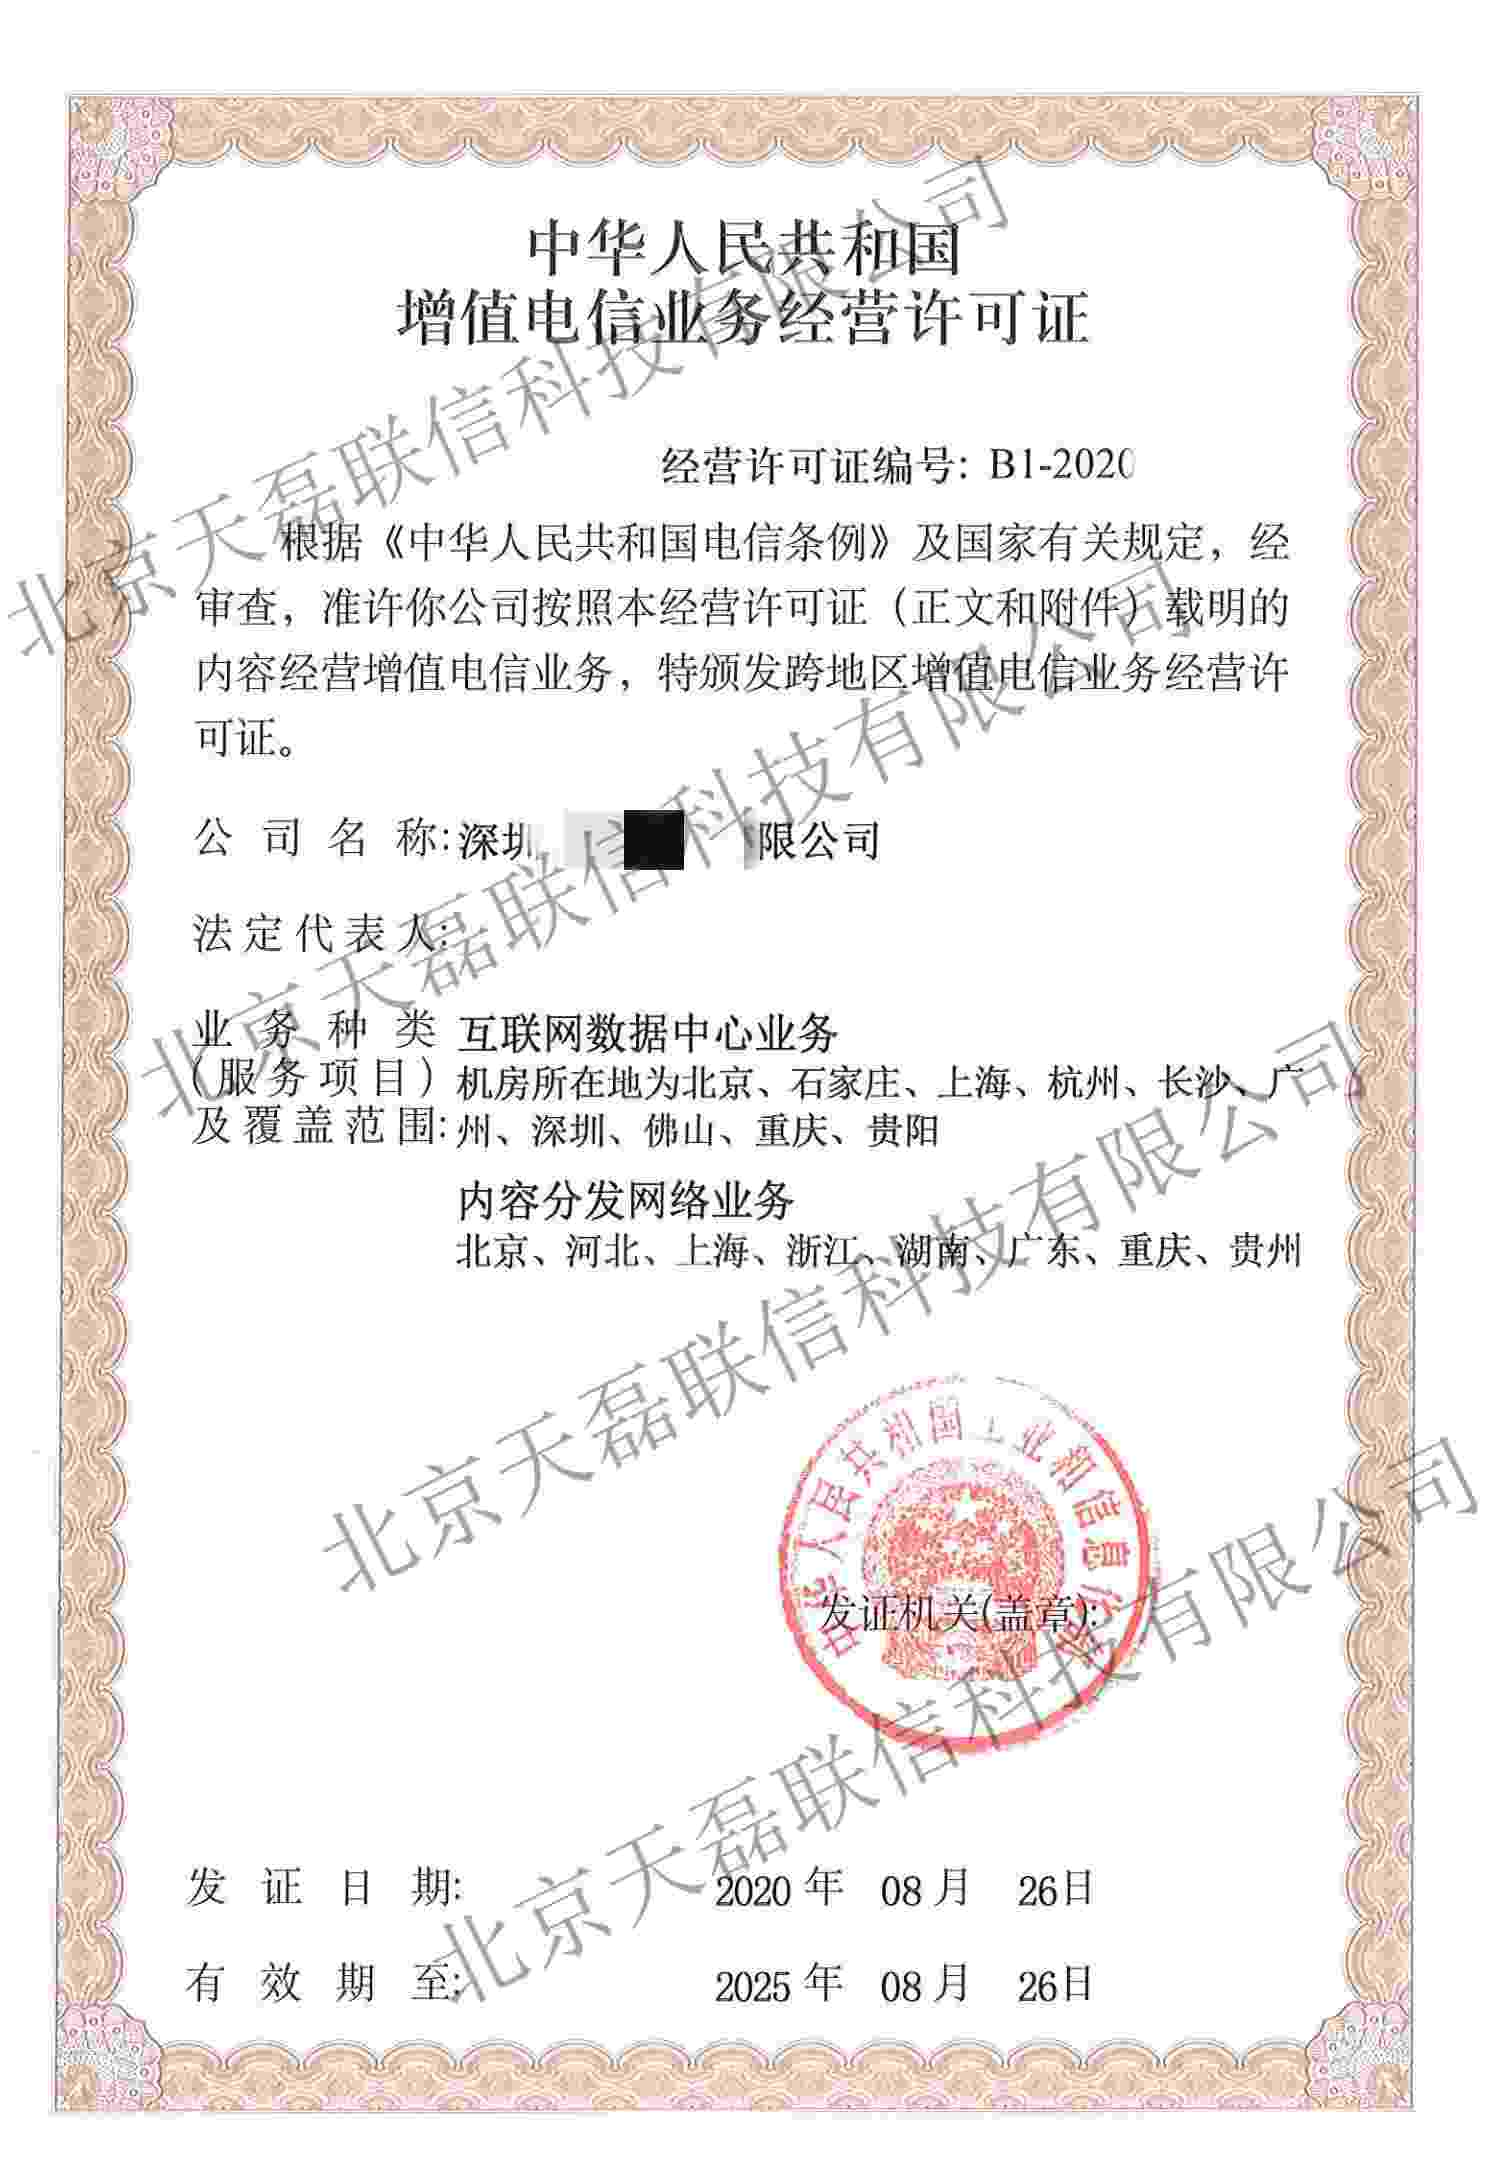 cdn许可证